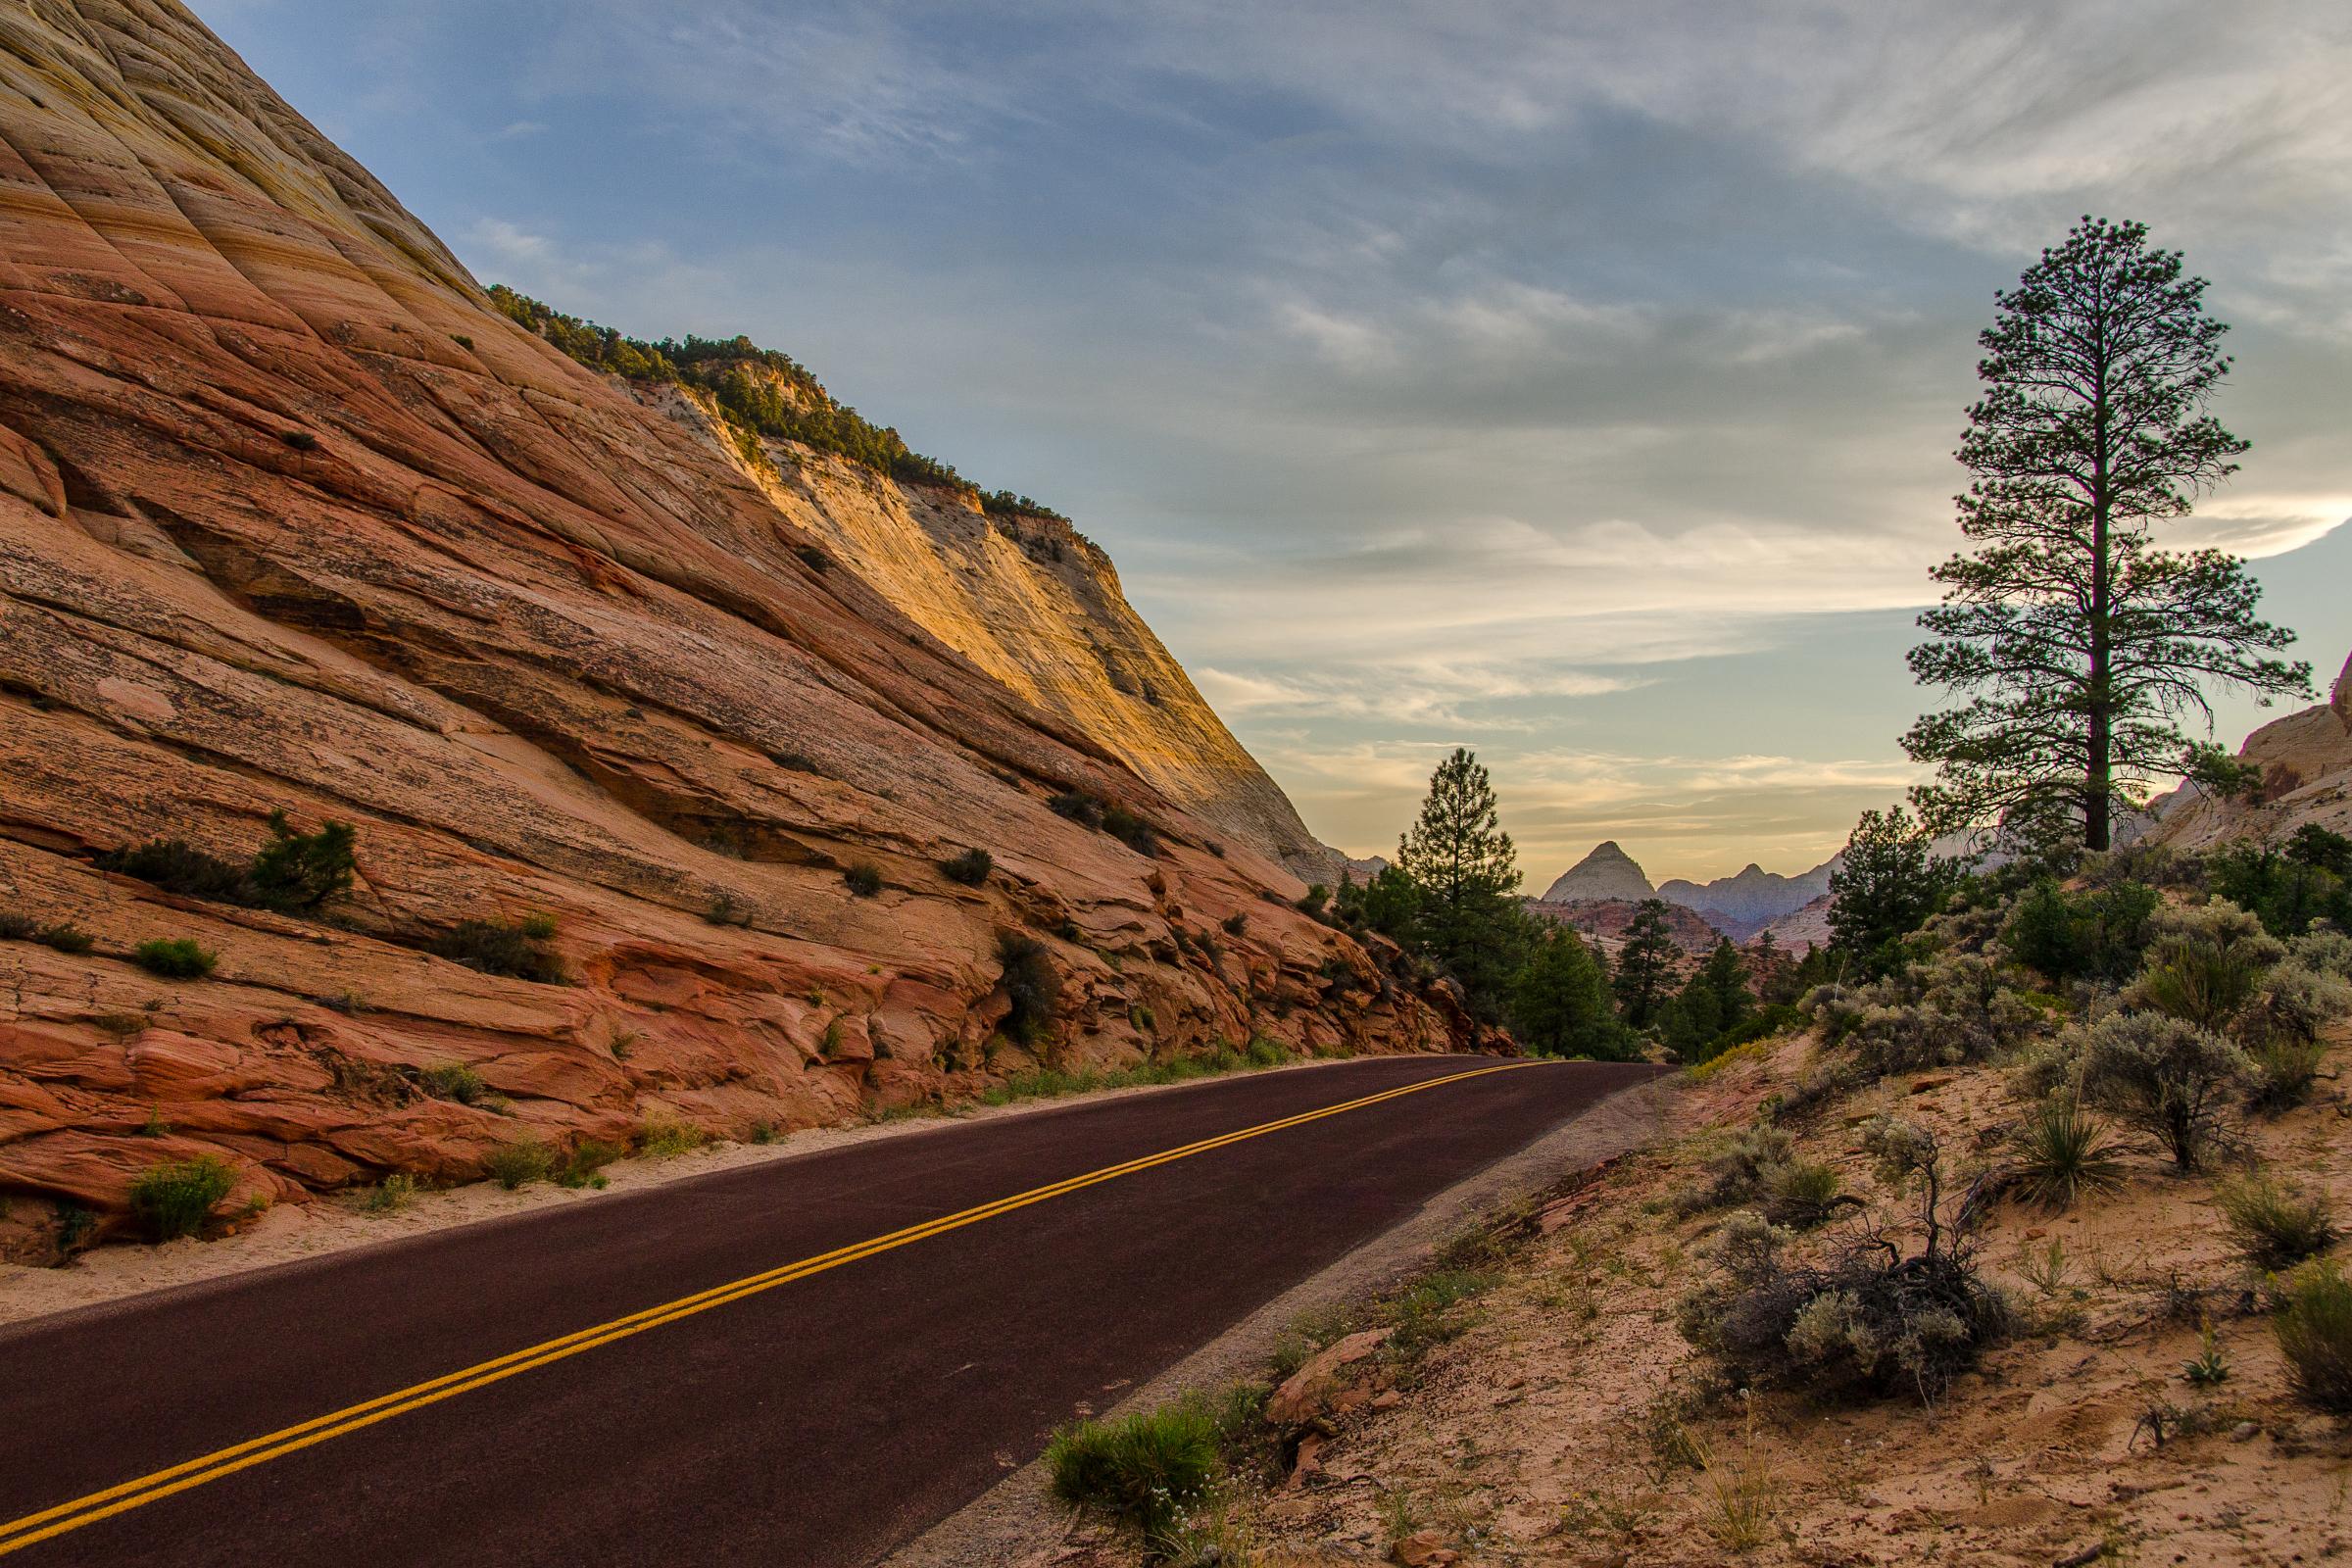 Zion National Park, Utah. Wasim Muklashy Photography